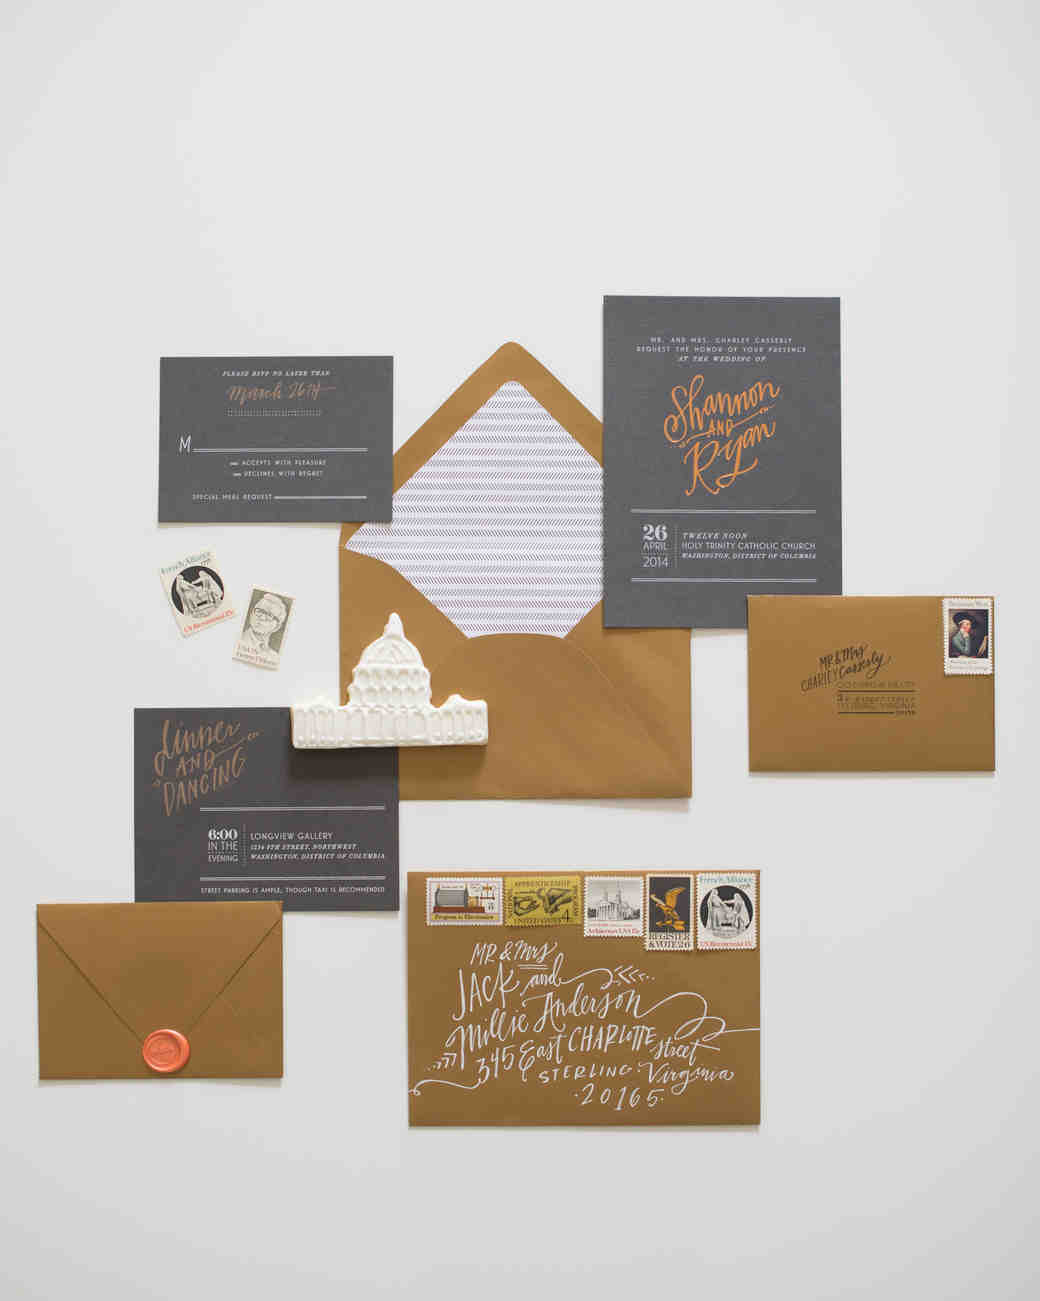 shannon-ryan-wedding-stationery-300-s111853-0415.jpg